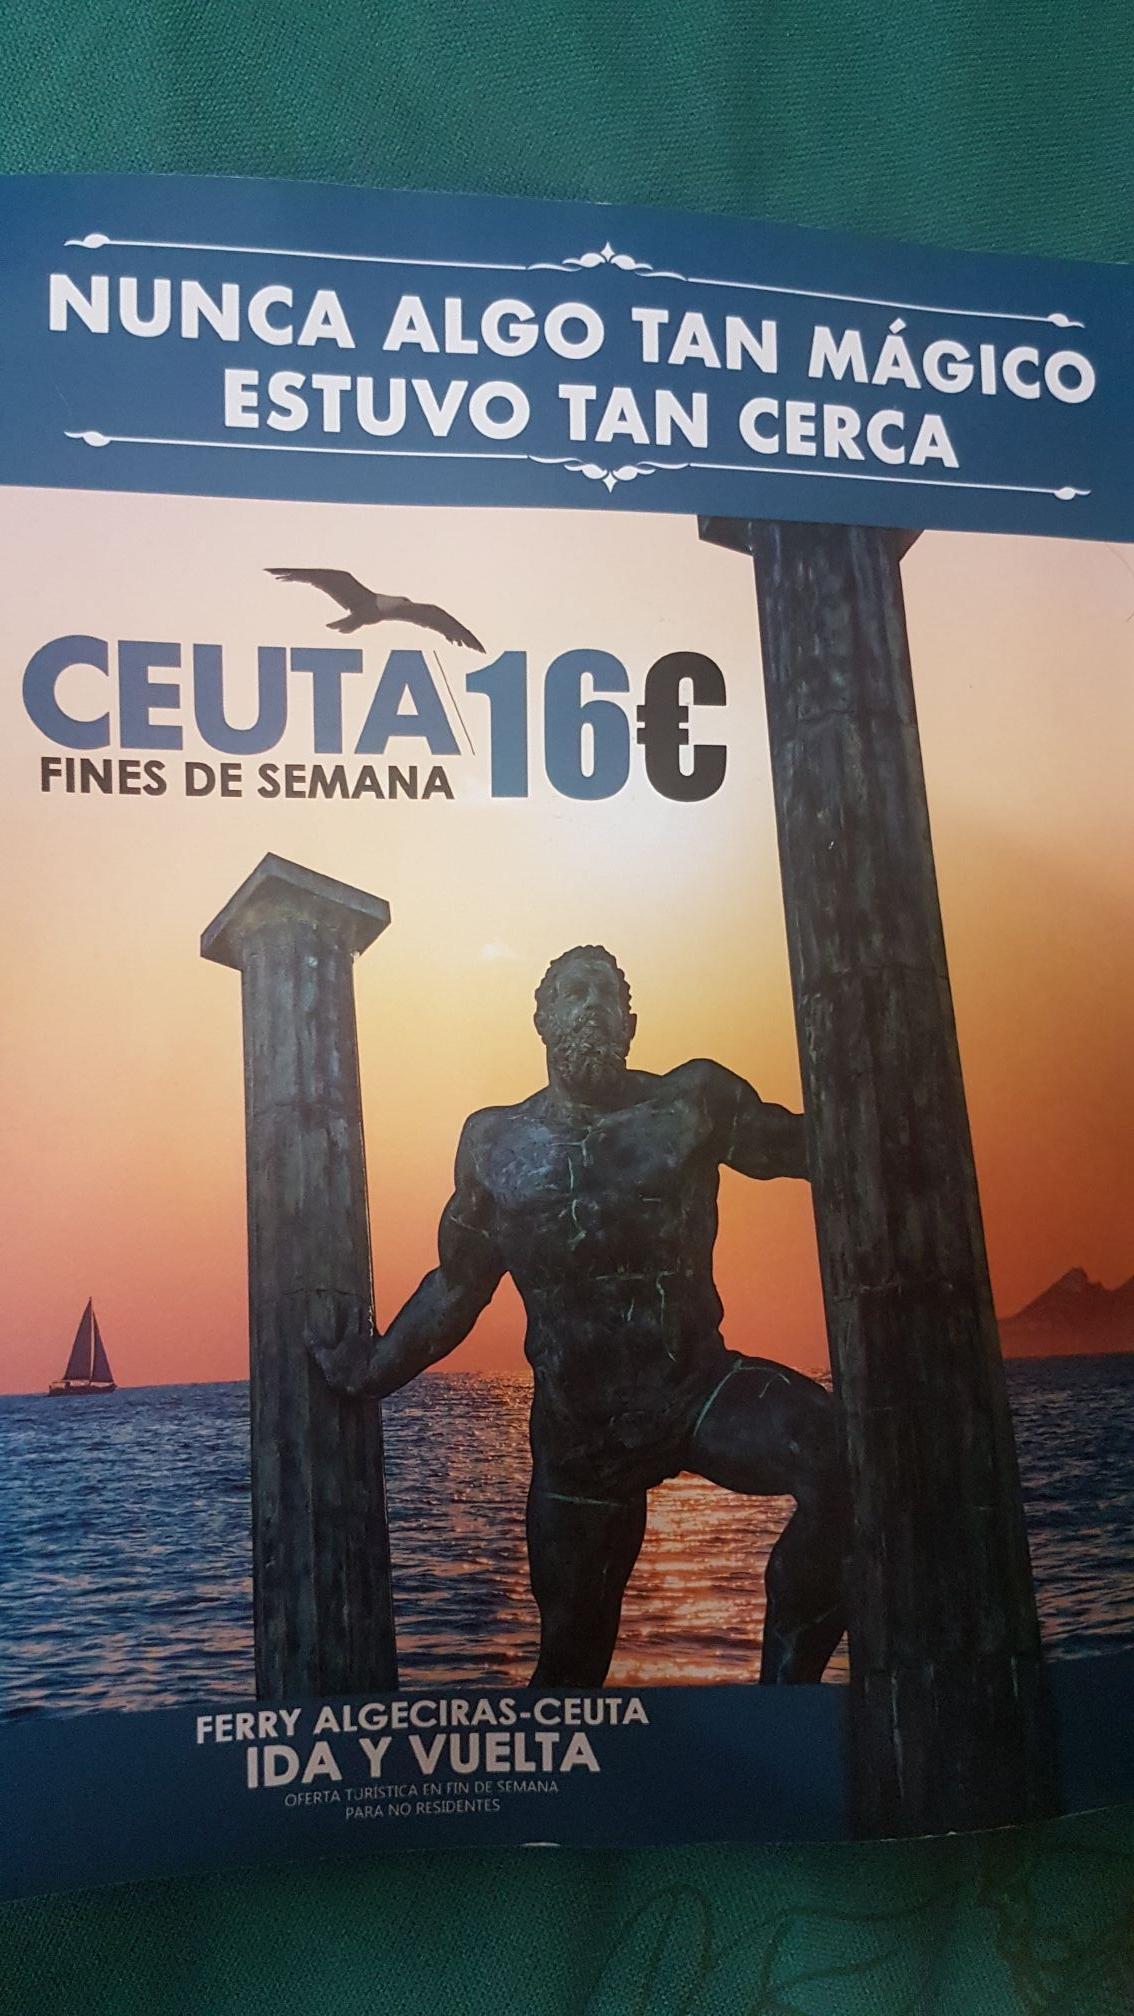 Ferry Algeciras-Ceuta